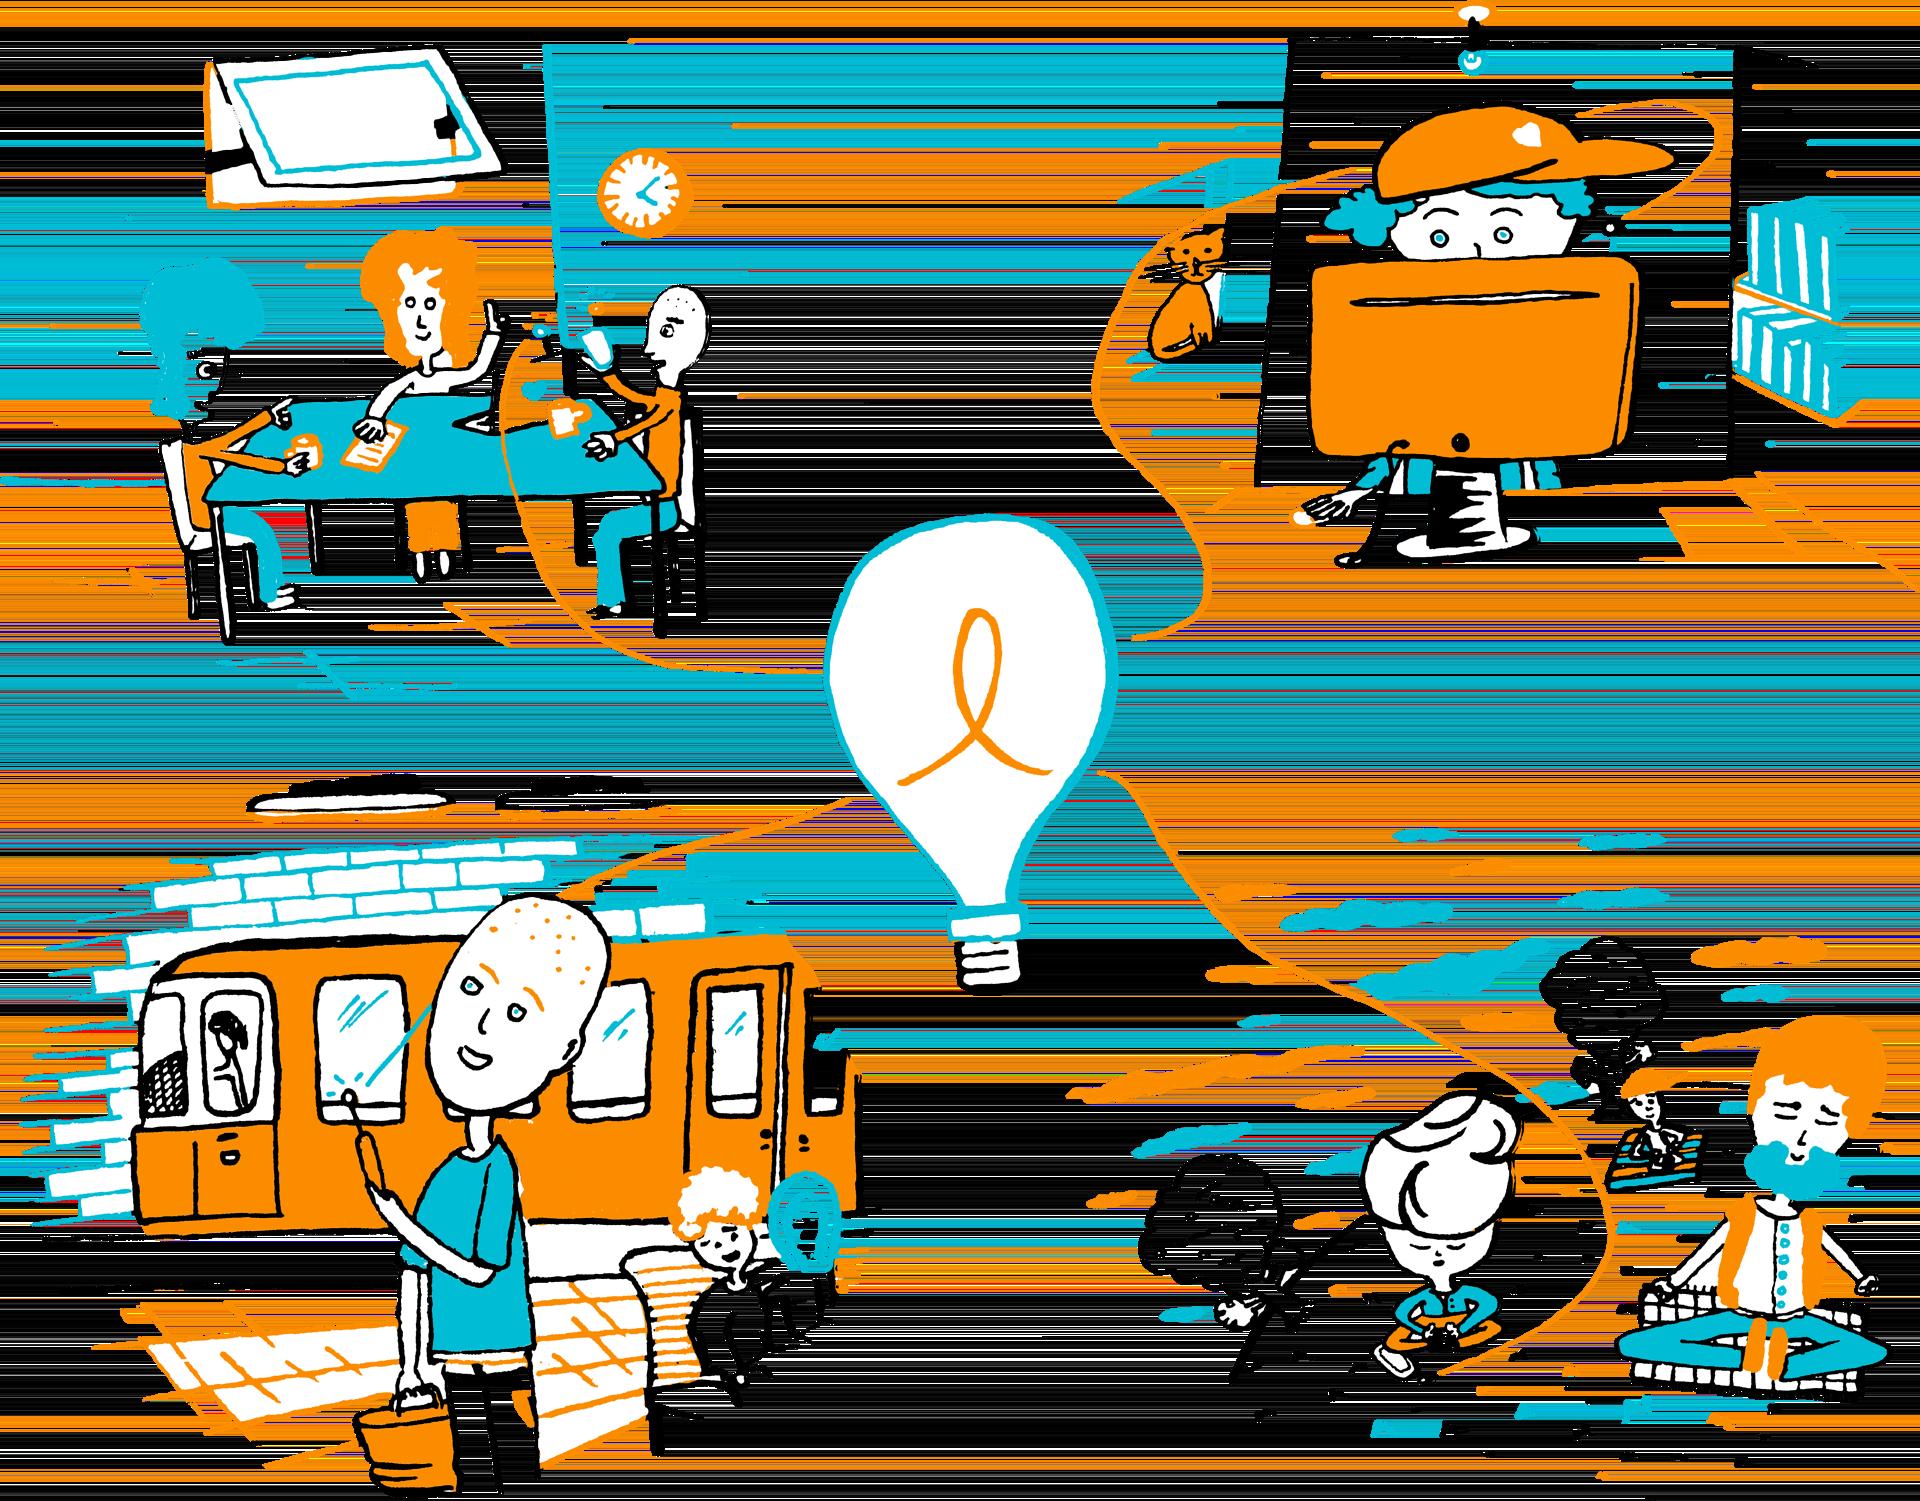 Una gran lamparilla el. Lightbulb clipart educational technology